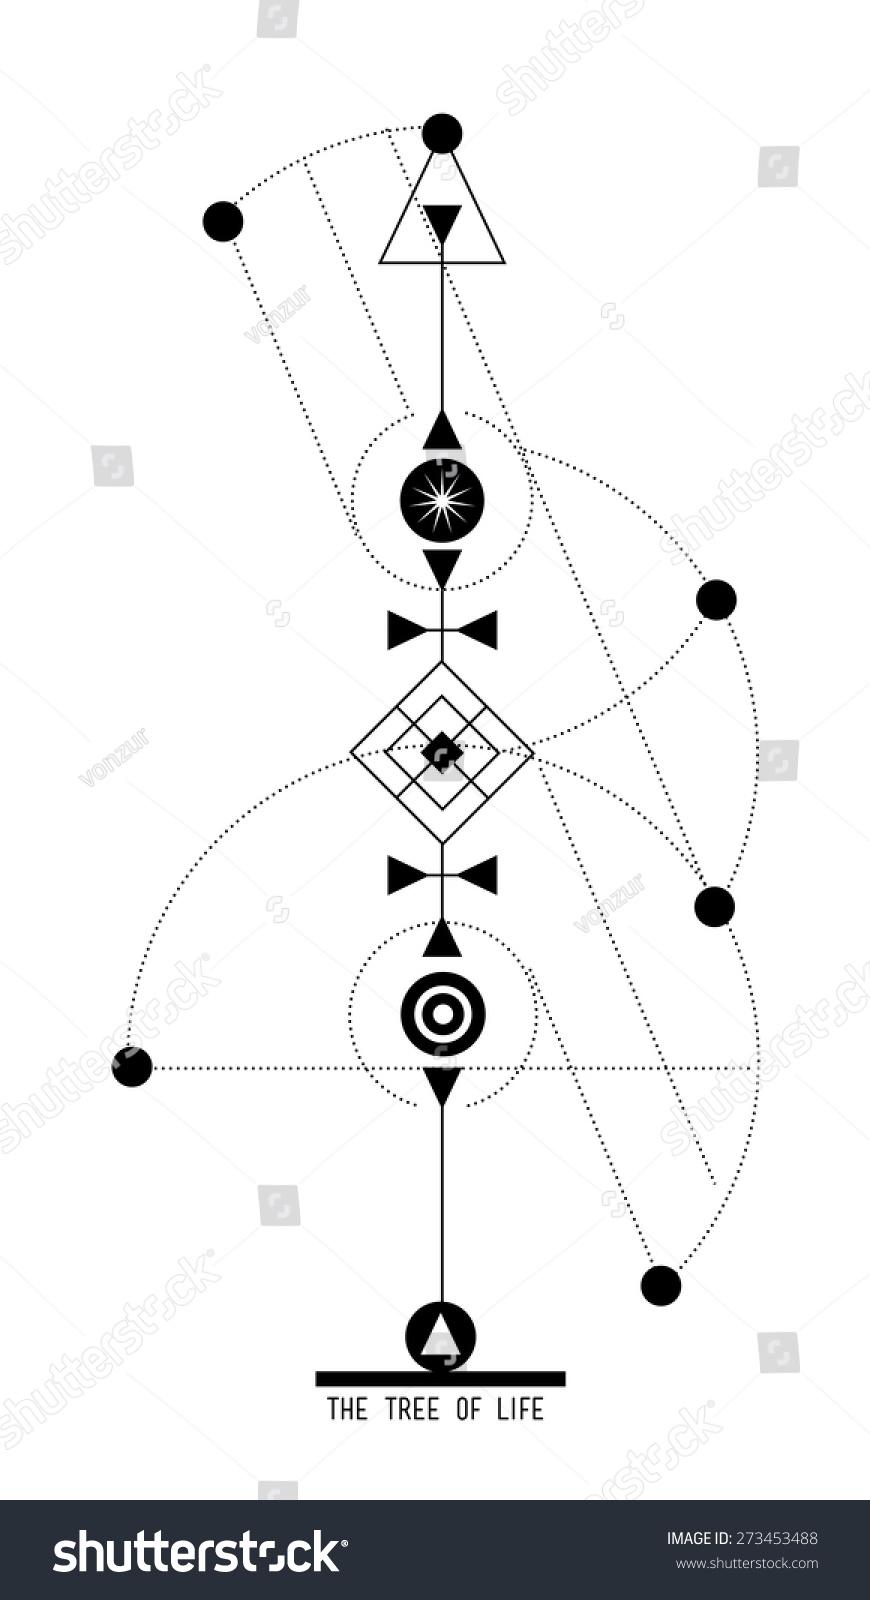 Tree life sigil geometric symbols jewish stock vector 273453488 the tree of life sigil geometric symbols in jewish kabbalah tradition abstract design element biocorpaavc Choice Image